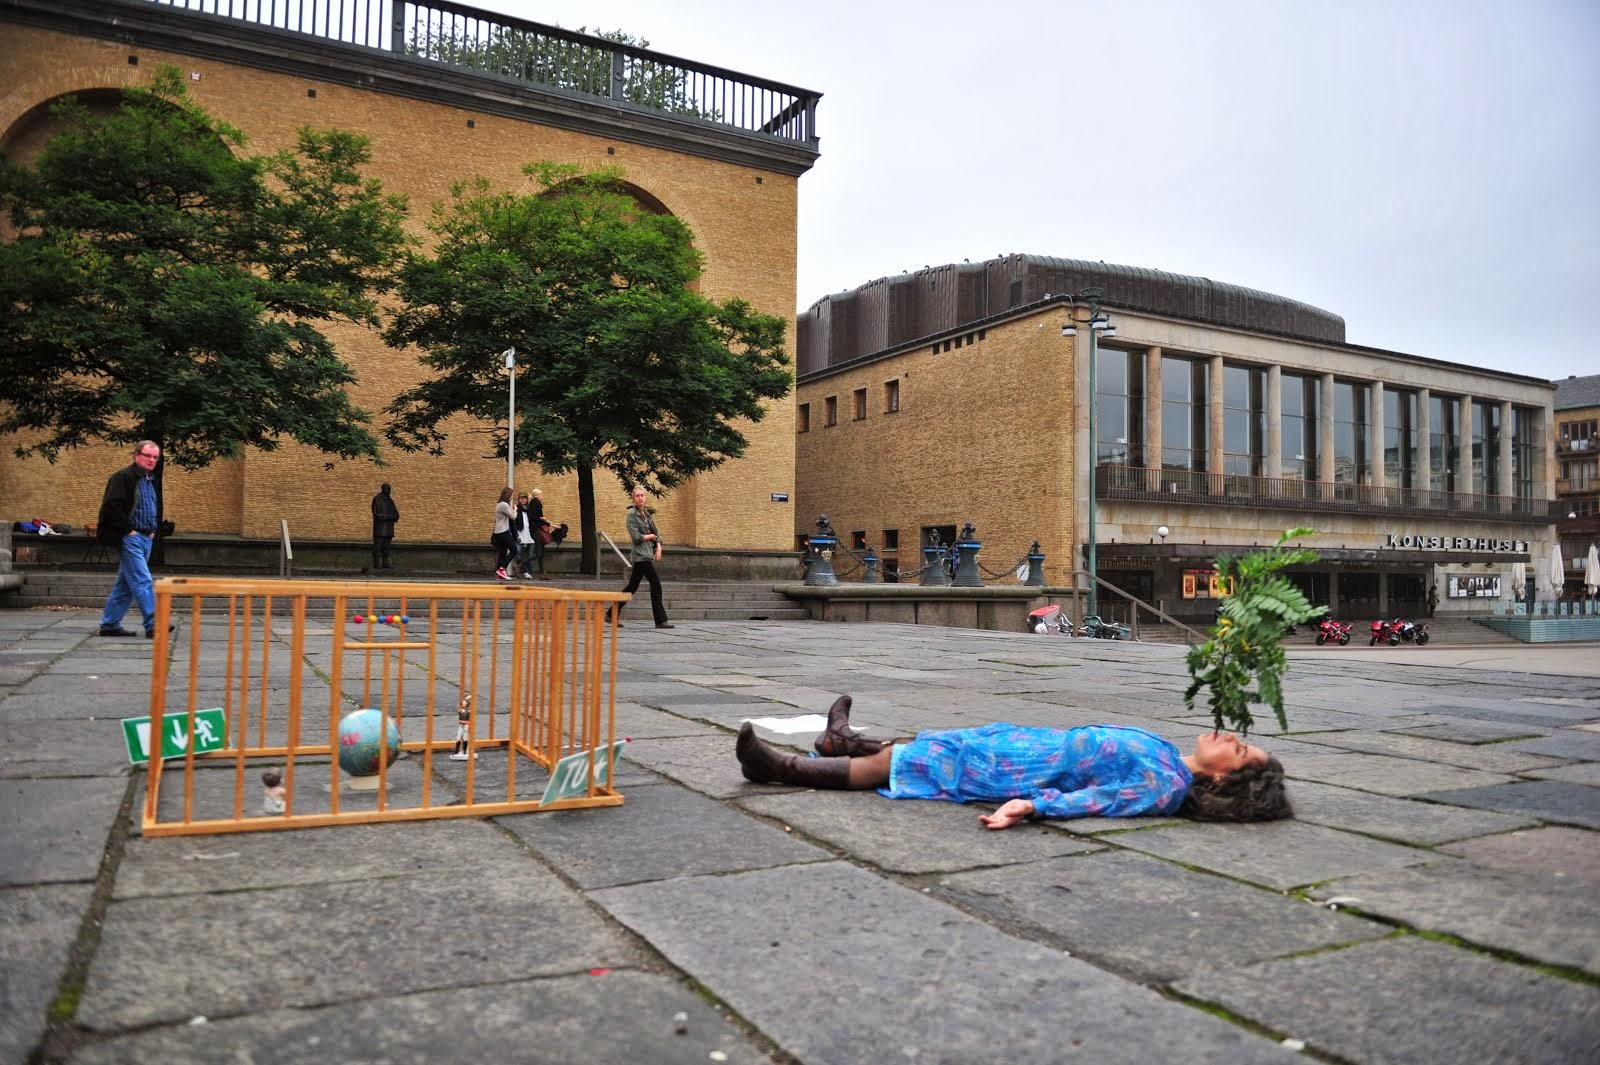 La Flor, live installation by Eli Neira, & La Pregunta del Mundo, installation, HGJ. Götaplatsen Square, Gothenburg. PAIAP11